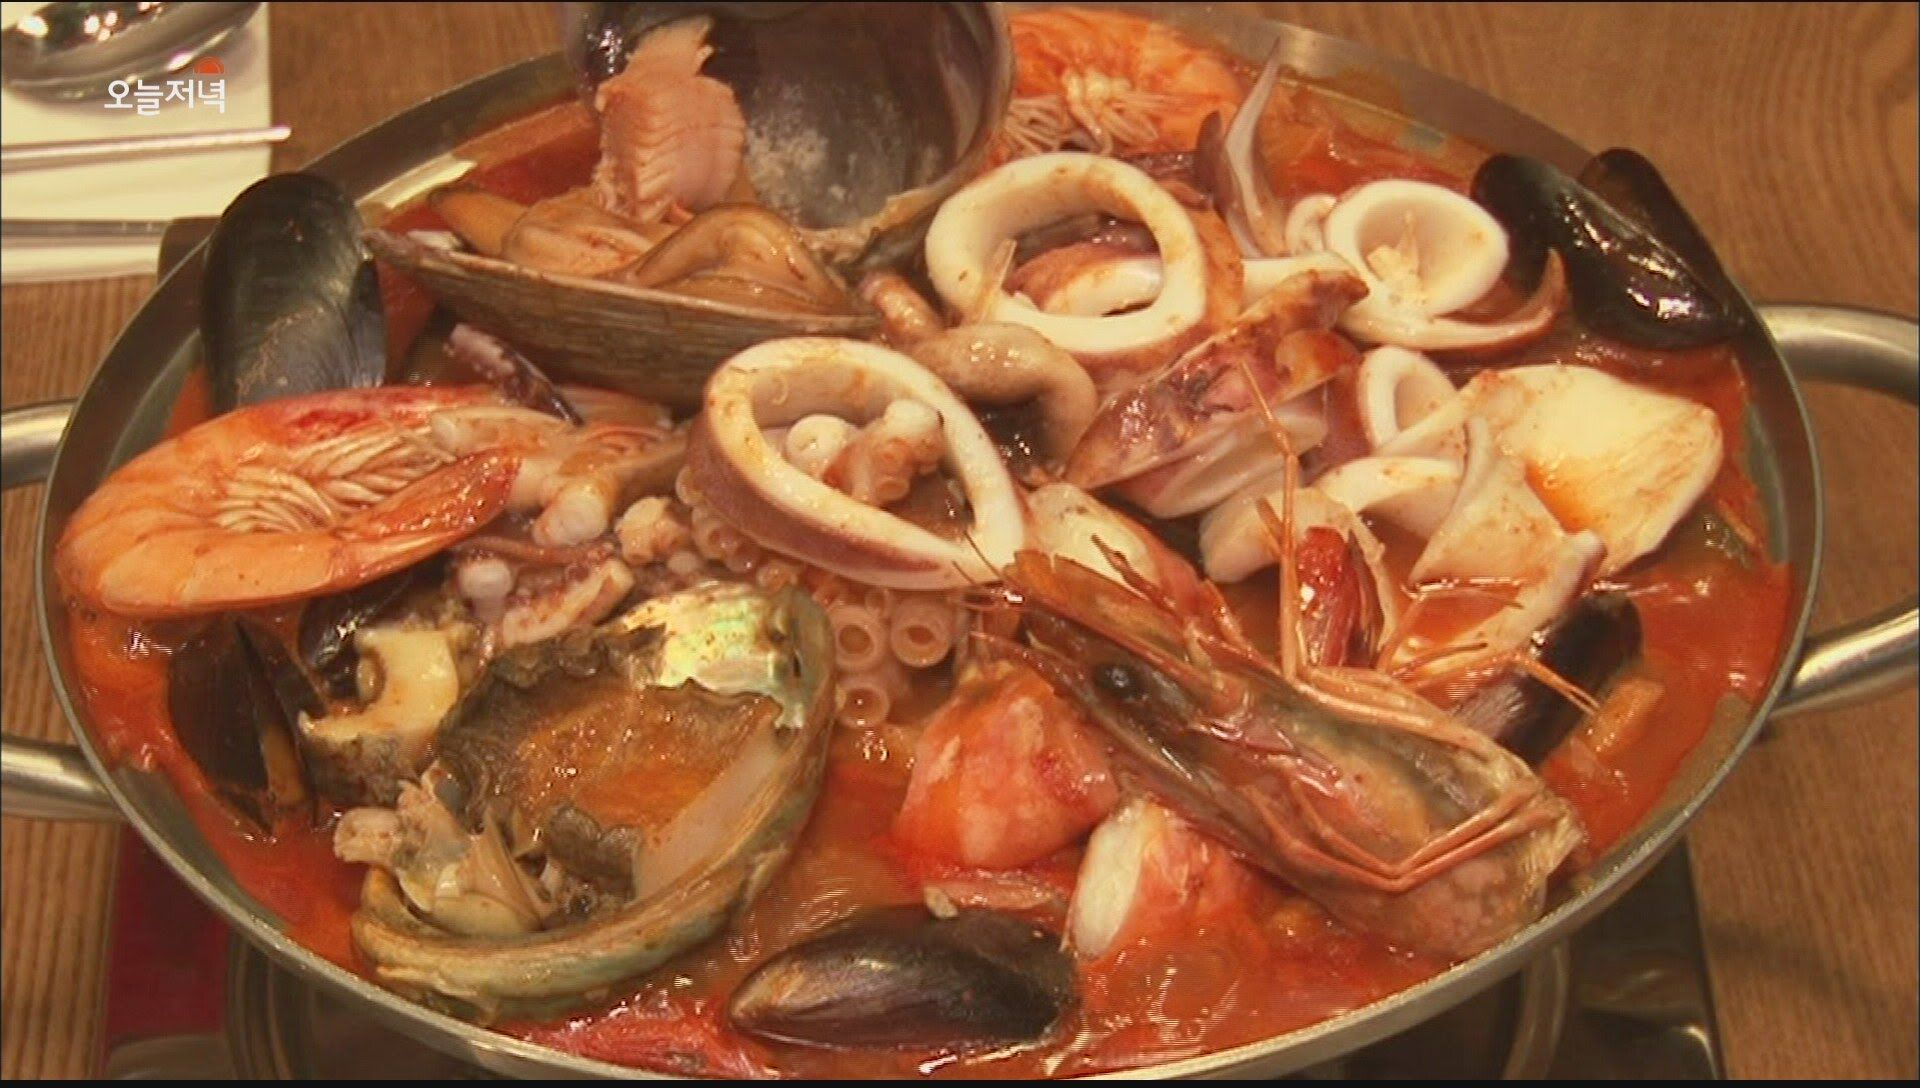 [Live Tonight] 생방송 오늘저녁 94회 - DSeafood rice cake embraces the sea! 바다를 품...